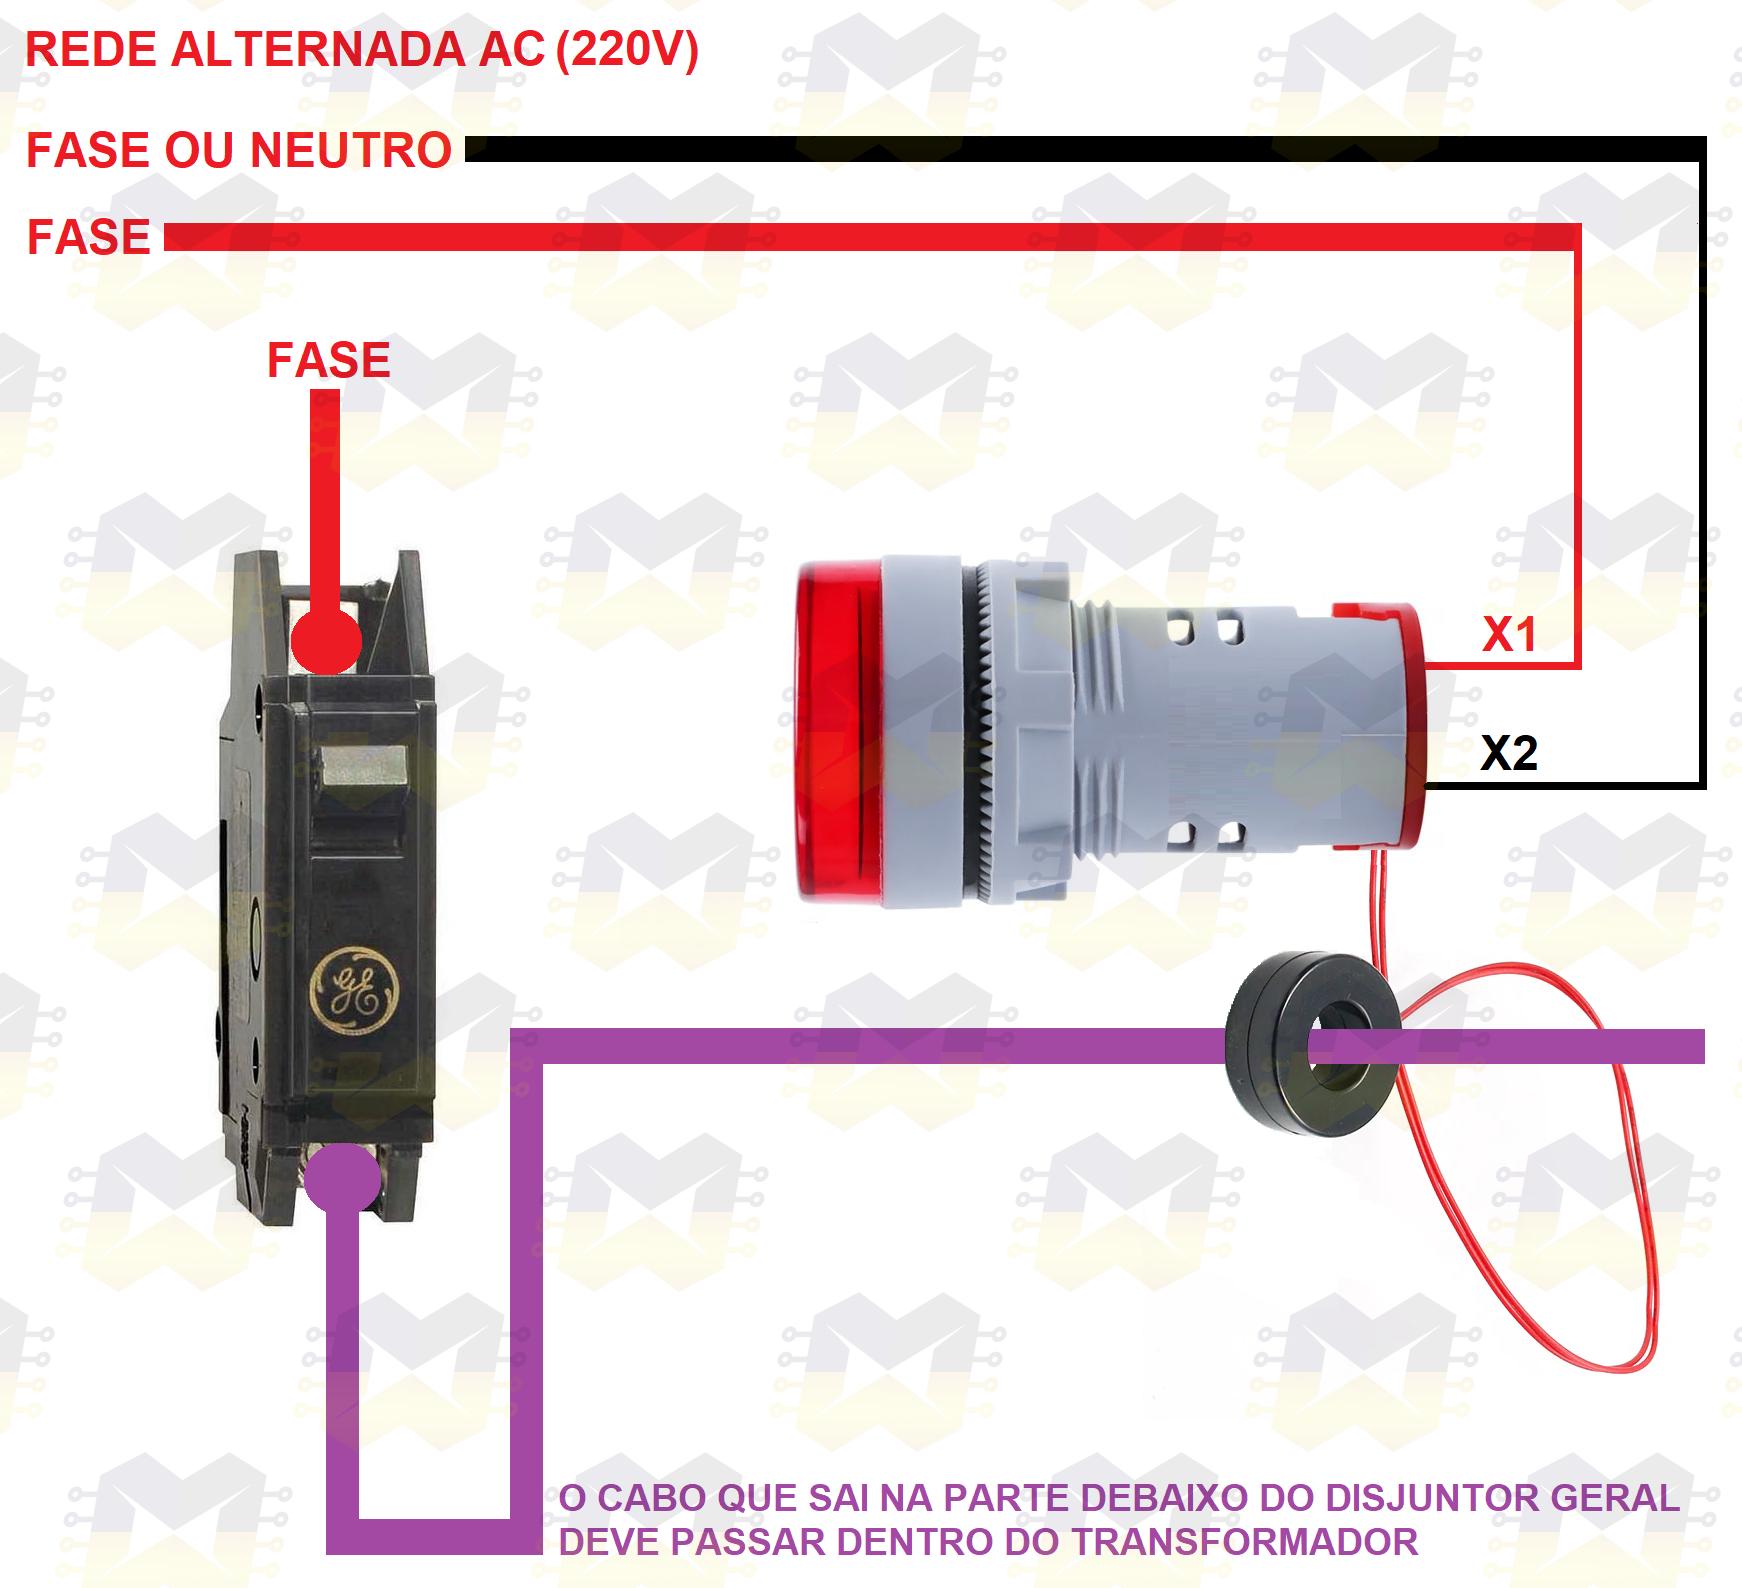 img07_medidor_tensao_corrente_frequencia_para_quadro_de_energia_voltimetro_amperimetro_frequencimetro_qdg_qde_transformador_trafo